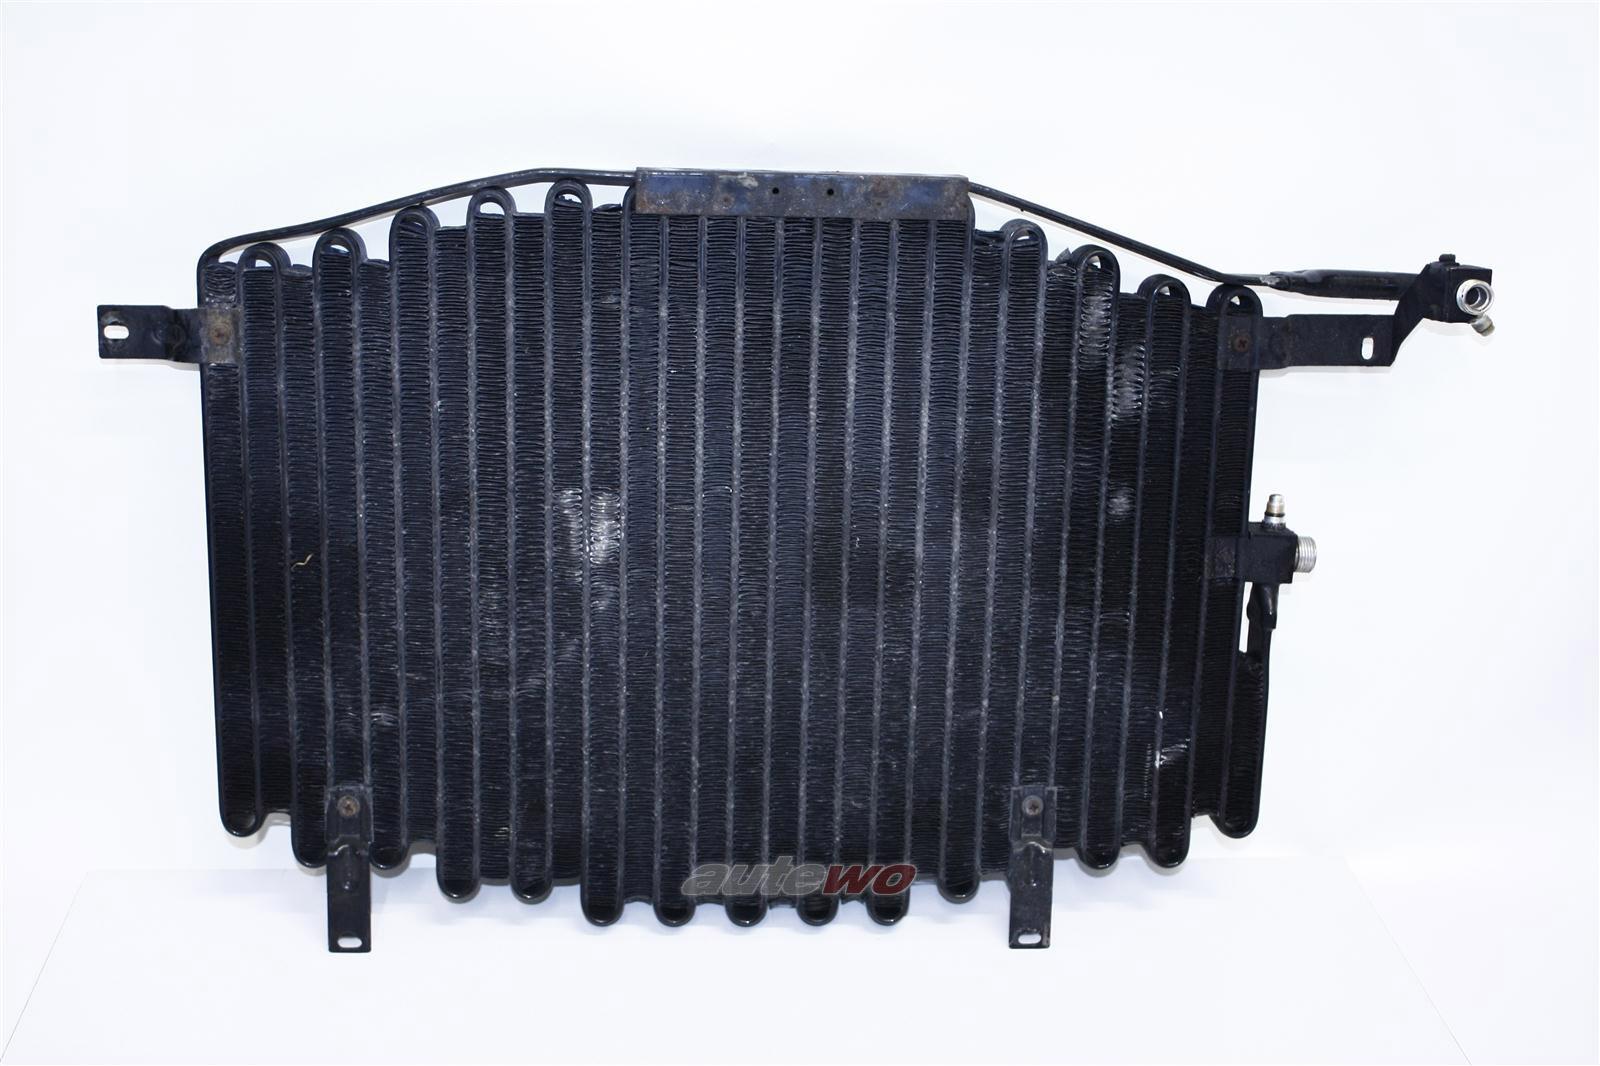 Audi 100 C4 Kältemittel-/Klima-Kondensator R12 4A0260403A 4A0260401A